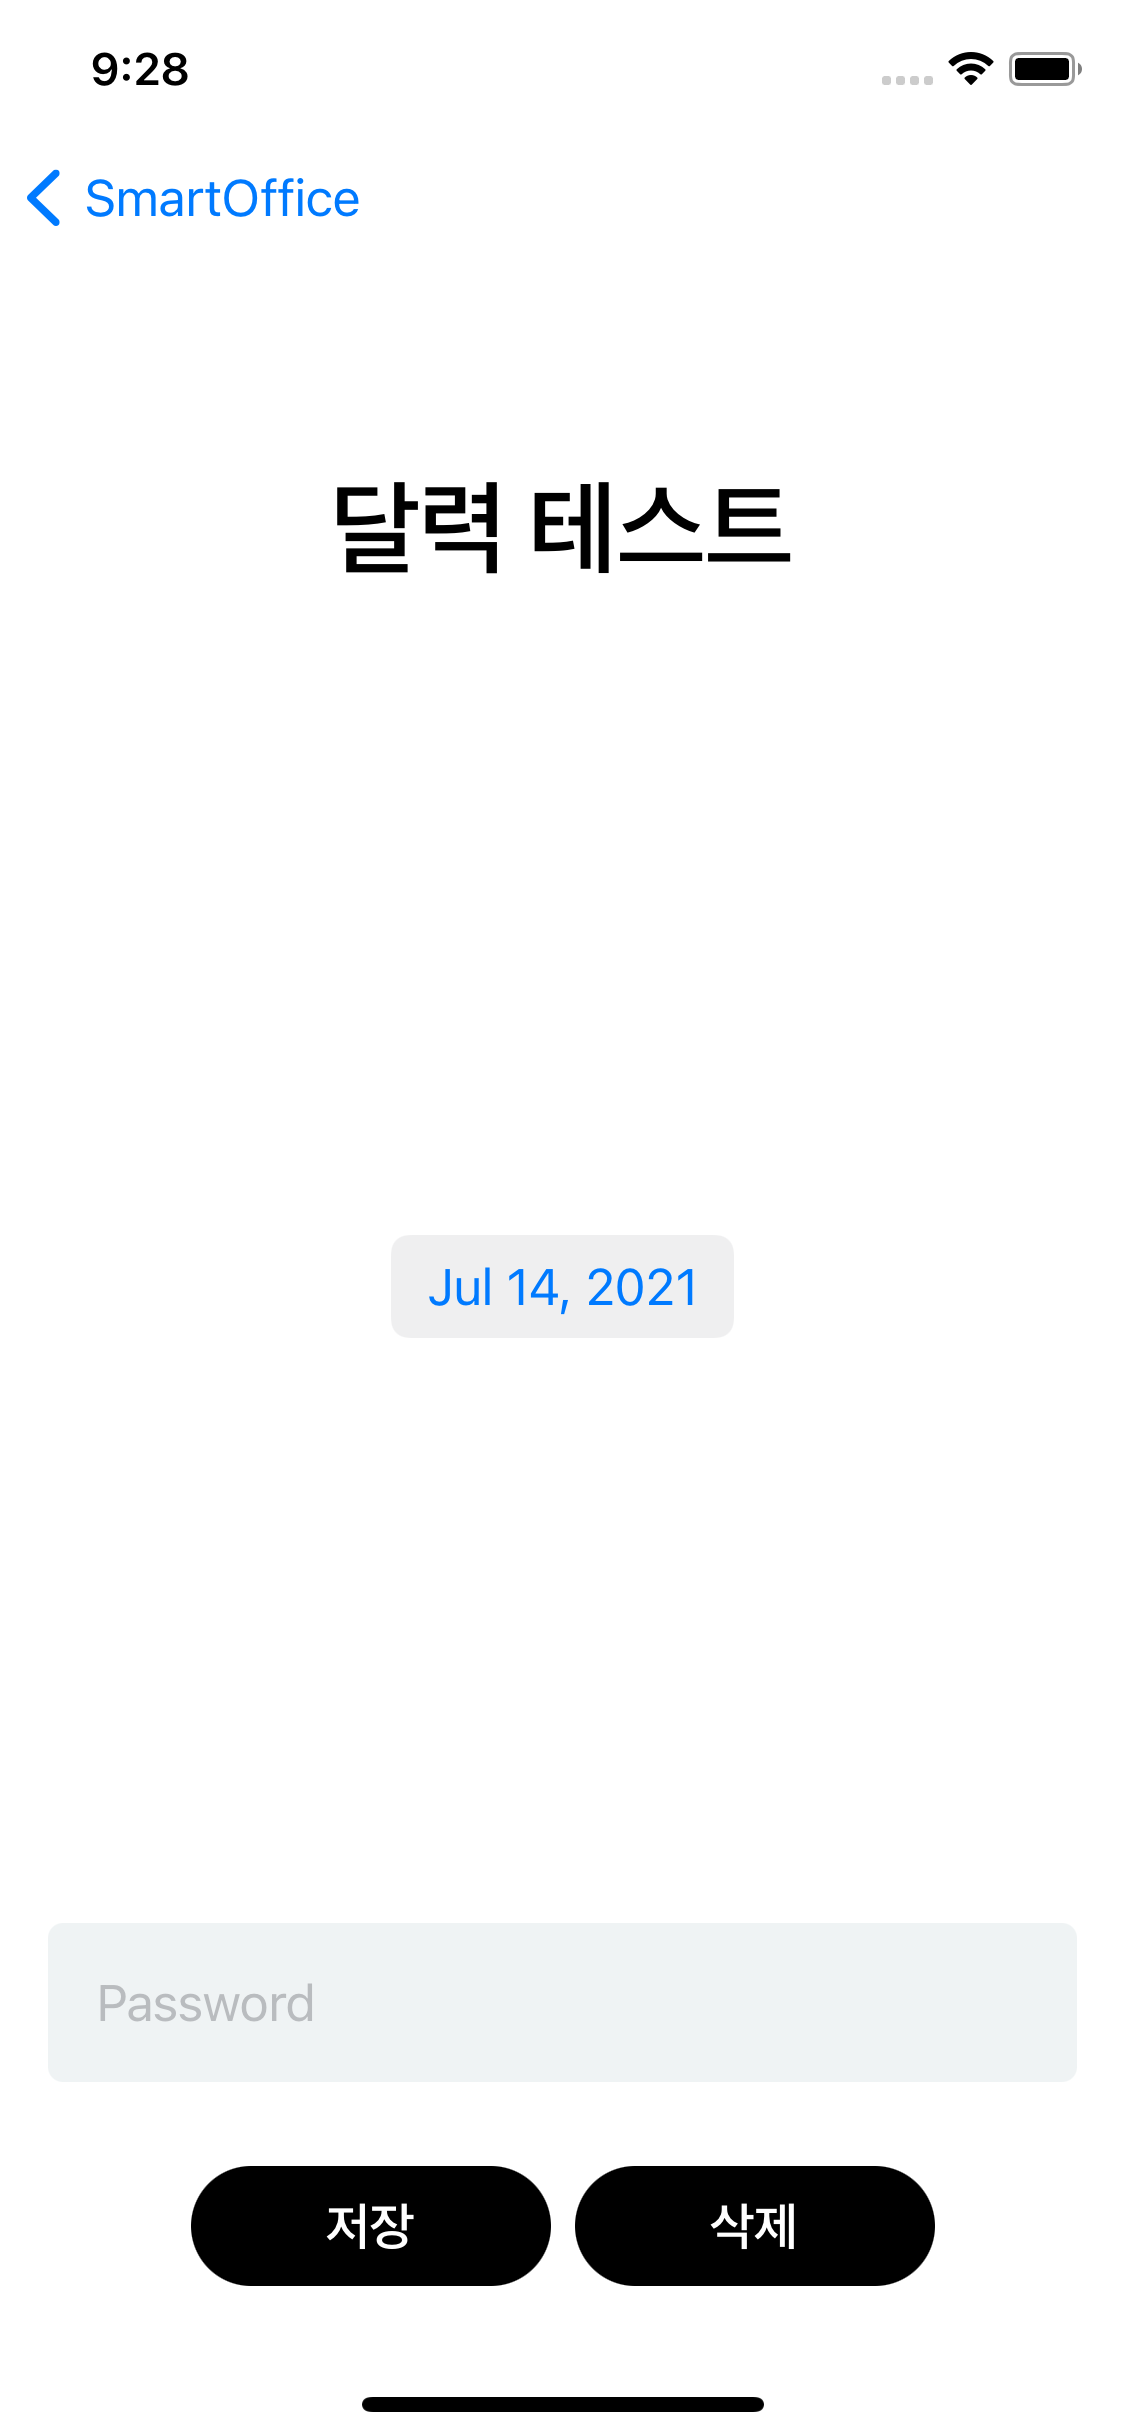 Simulator Screen Shot - iPhone 11 Pro - 2021-07-15 at 21.28.06.png